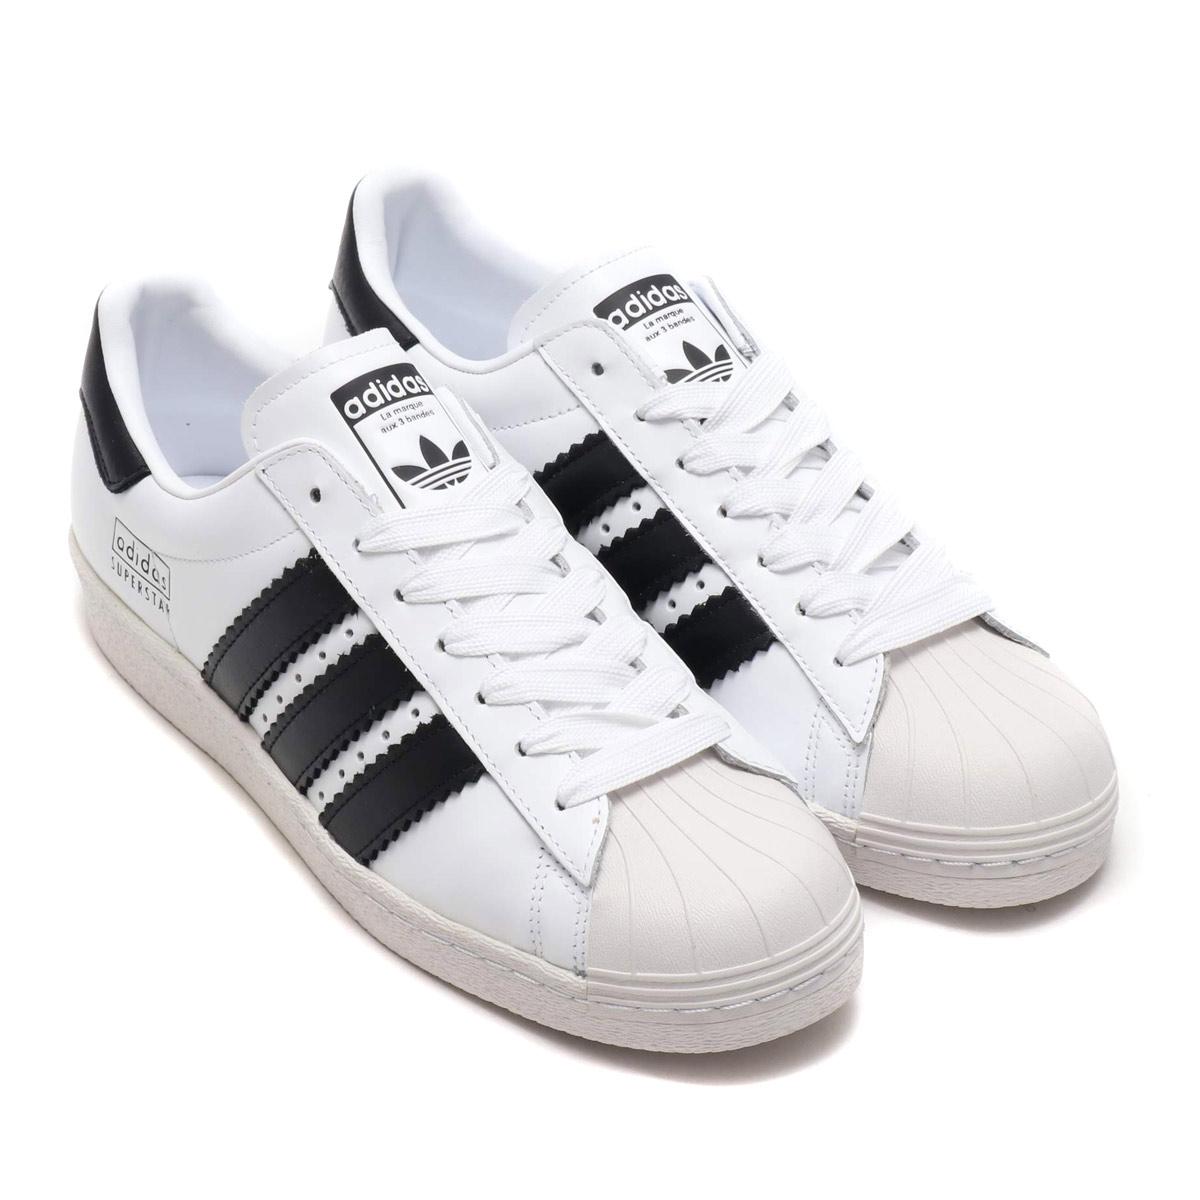 adidas Originals SUPERSTAR 80s (アディダスオリジナルス スーパースター 80s)RUNNING WHITE/CORE BLACK/WHITE【メンズ レディース スニーカー】18FW-I